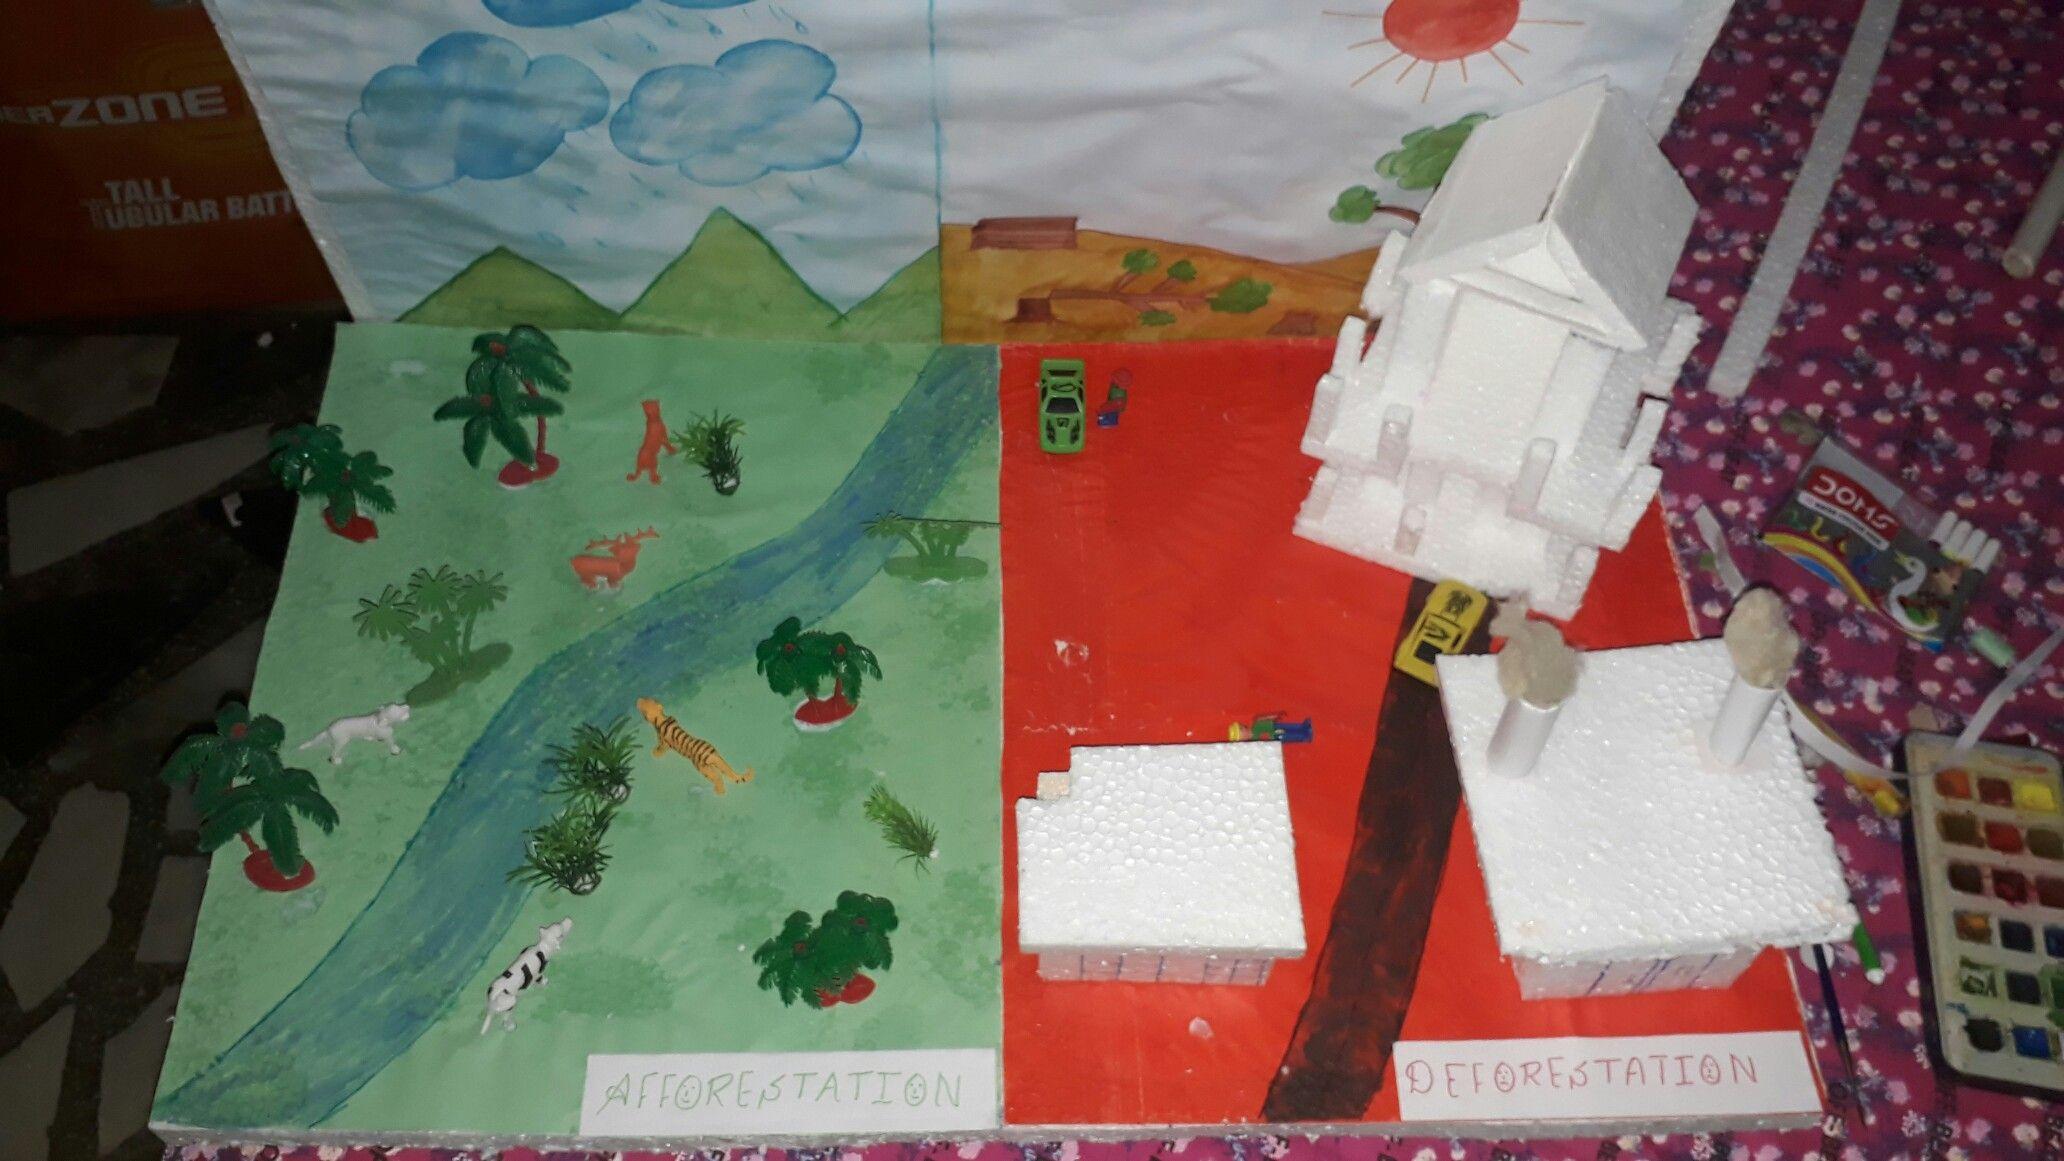 Deforestation Social Science Project Model For Science